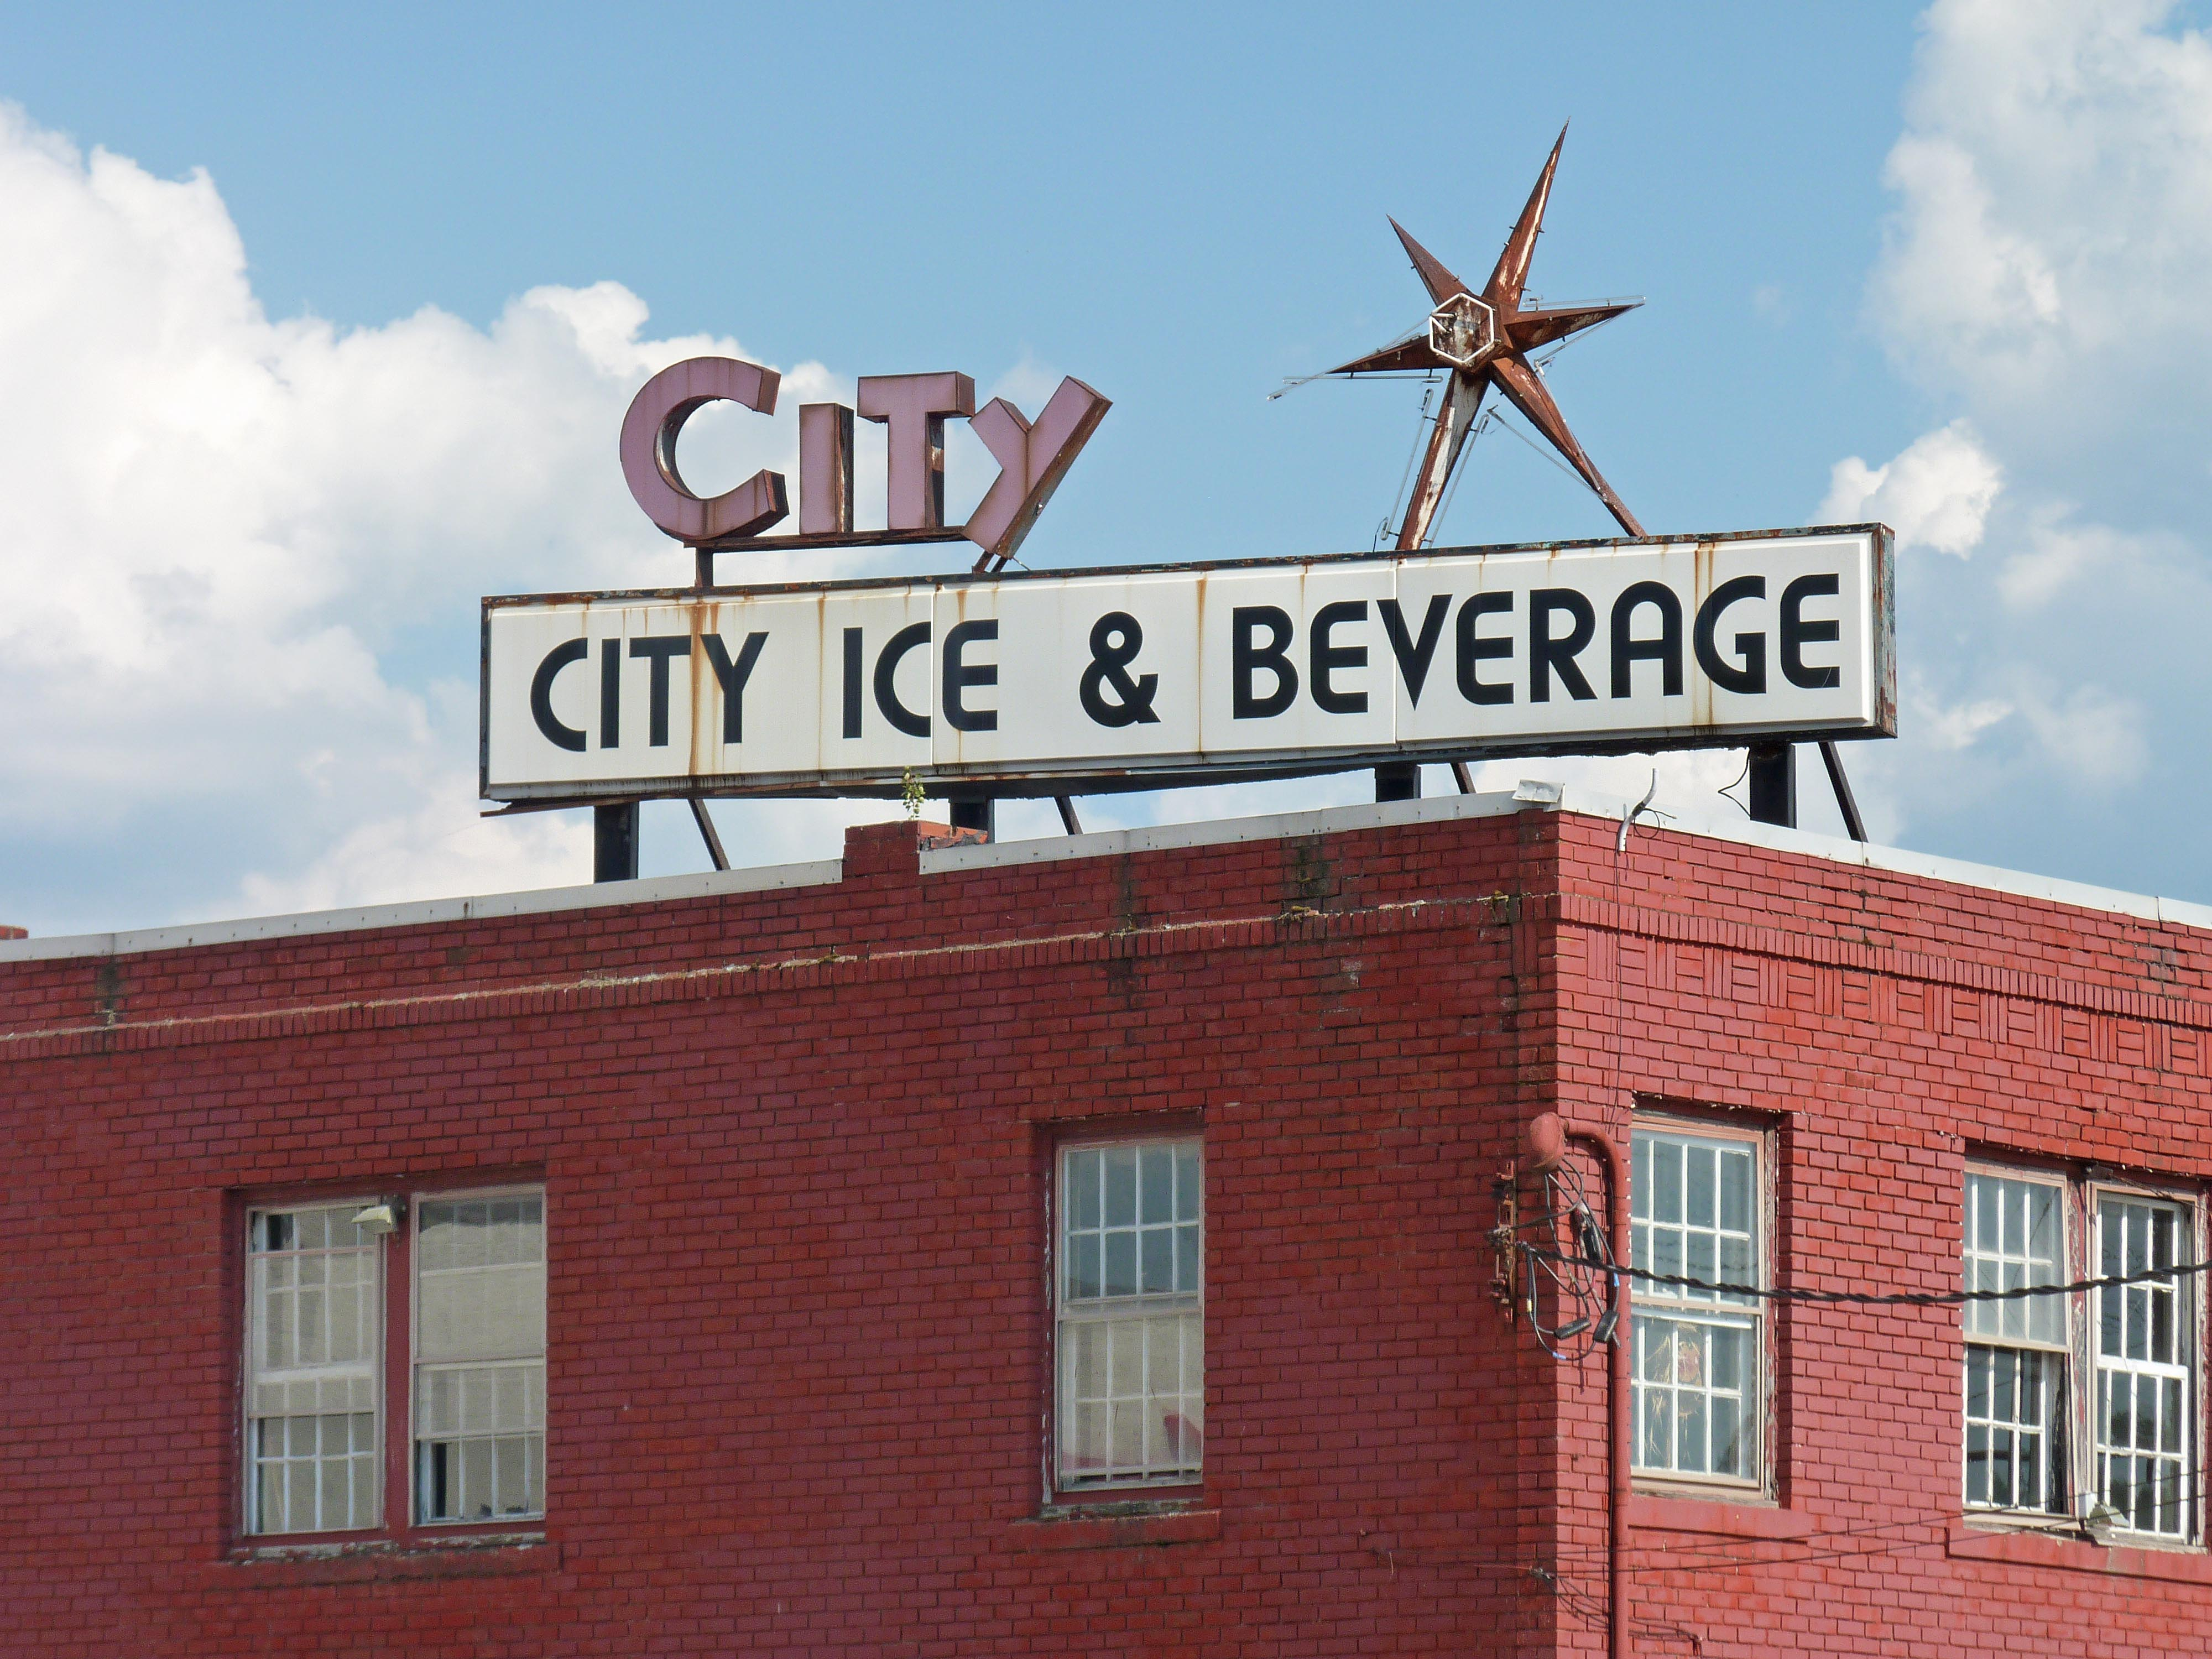 City Ice and Beverage - 206 Pennsylvania Ave East, Warren, Pennsylvania U.S.A. - June 1, 2016